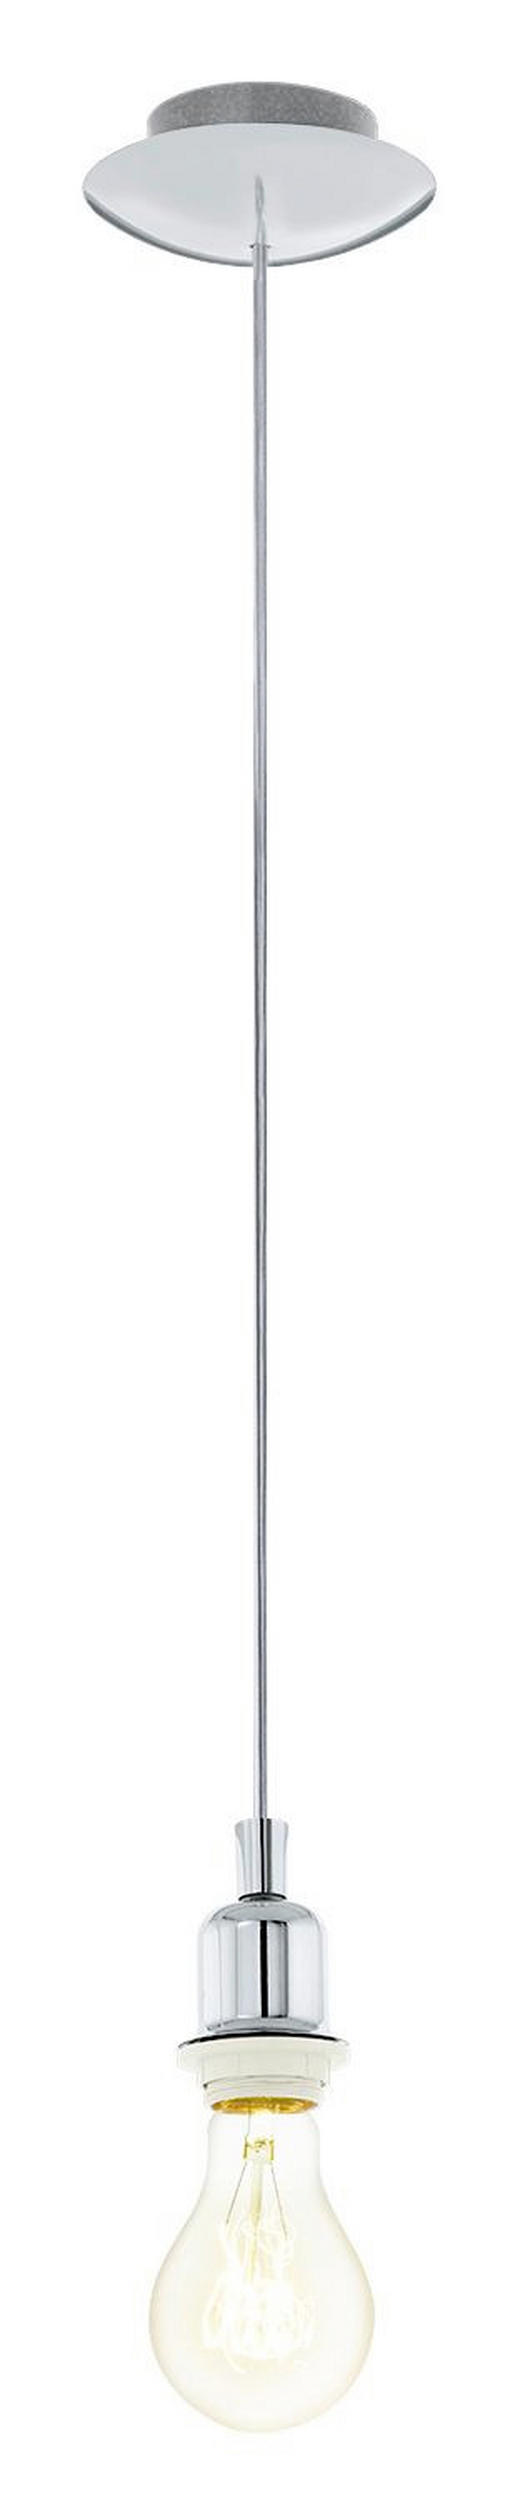 SCHNURPENDEL - Chromfarben, Basics, Metall (12/110cm) - Marama